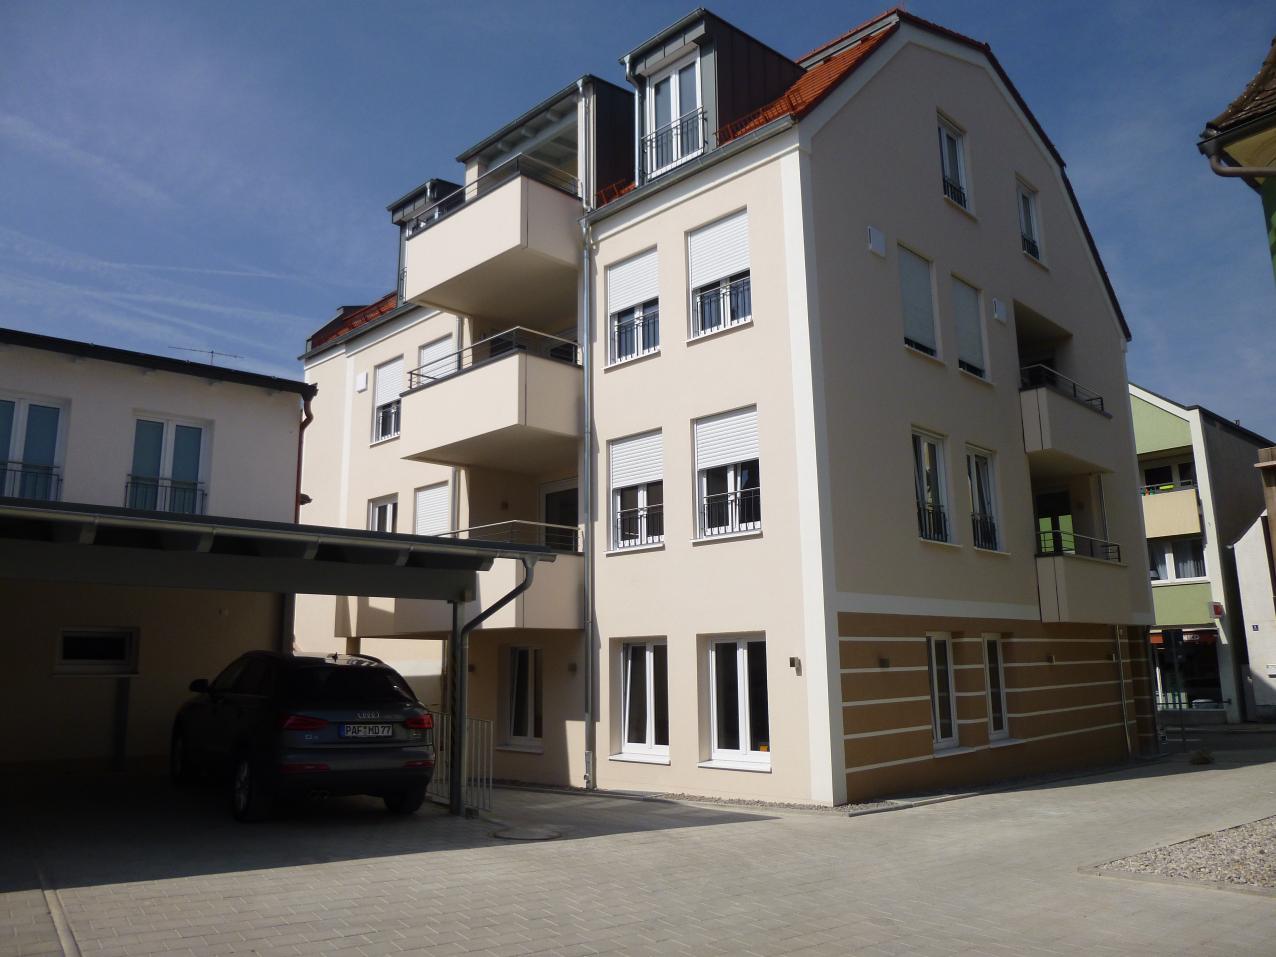 klosterstrasse2a_04